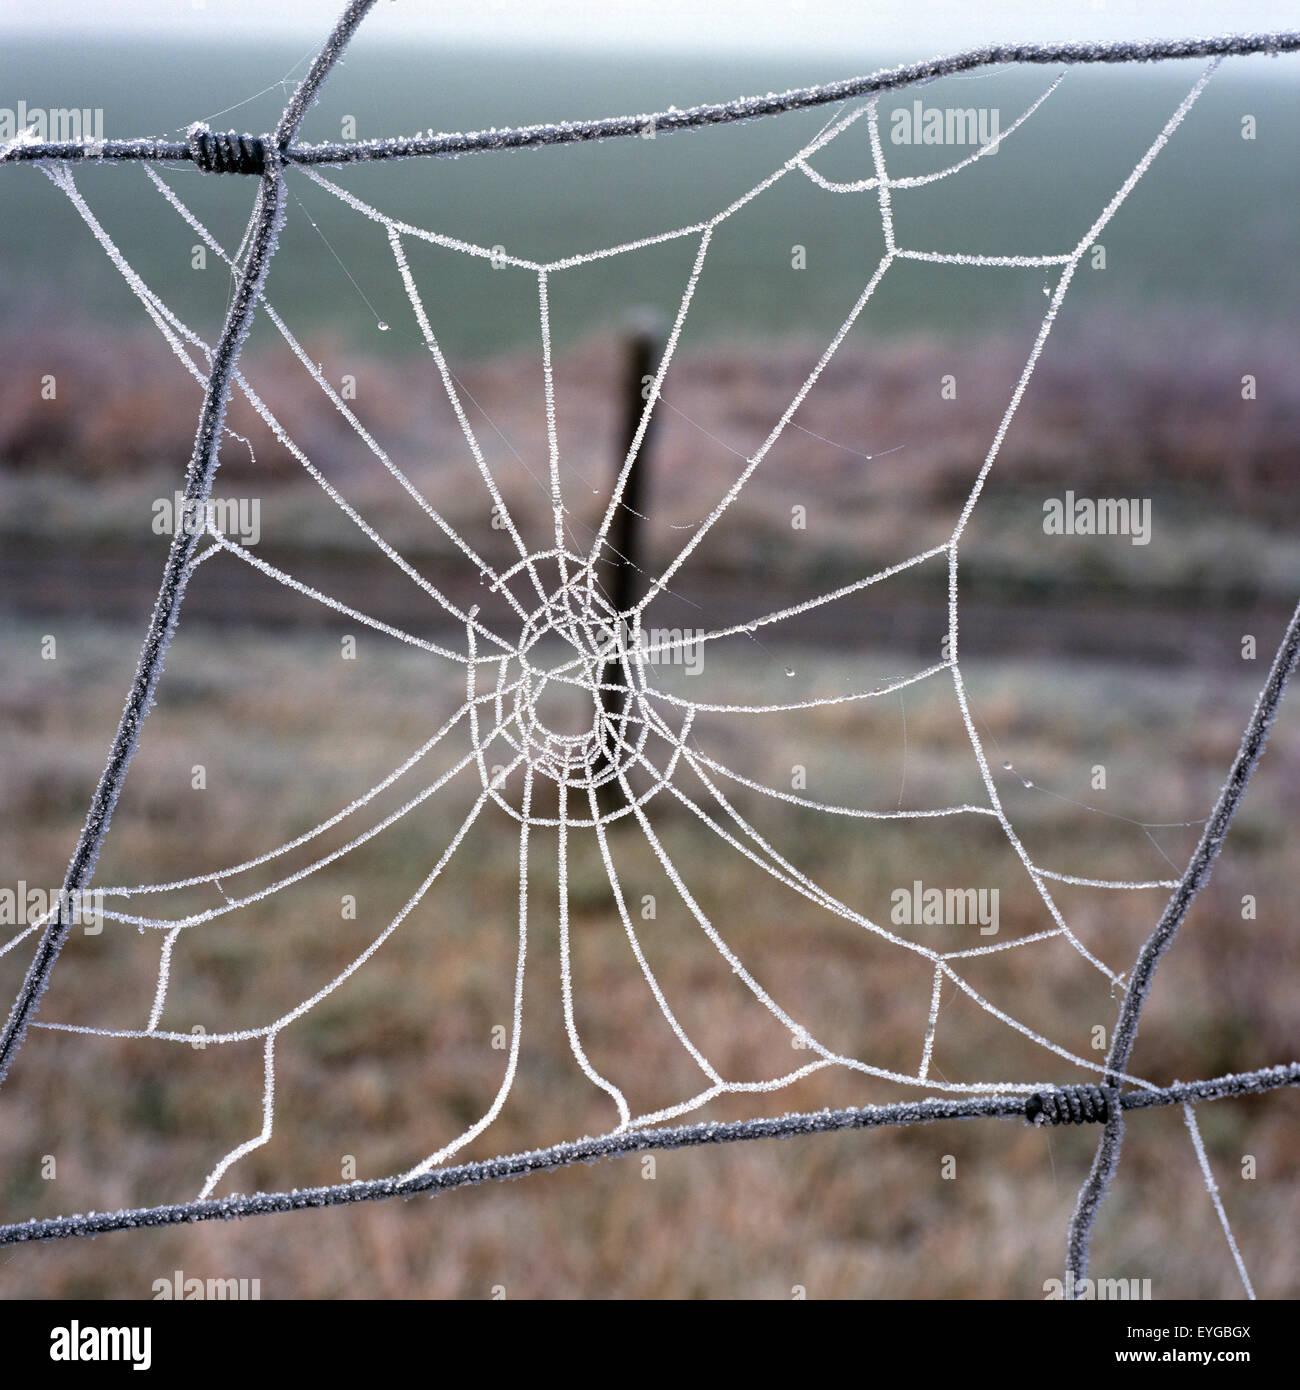 Spinnwebe, - Stock Image